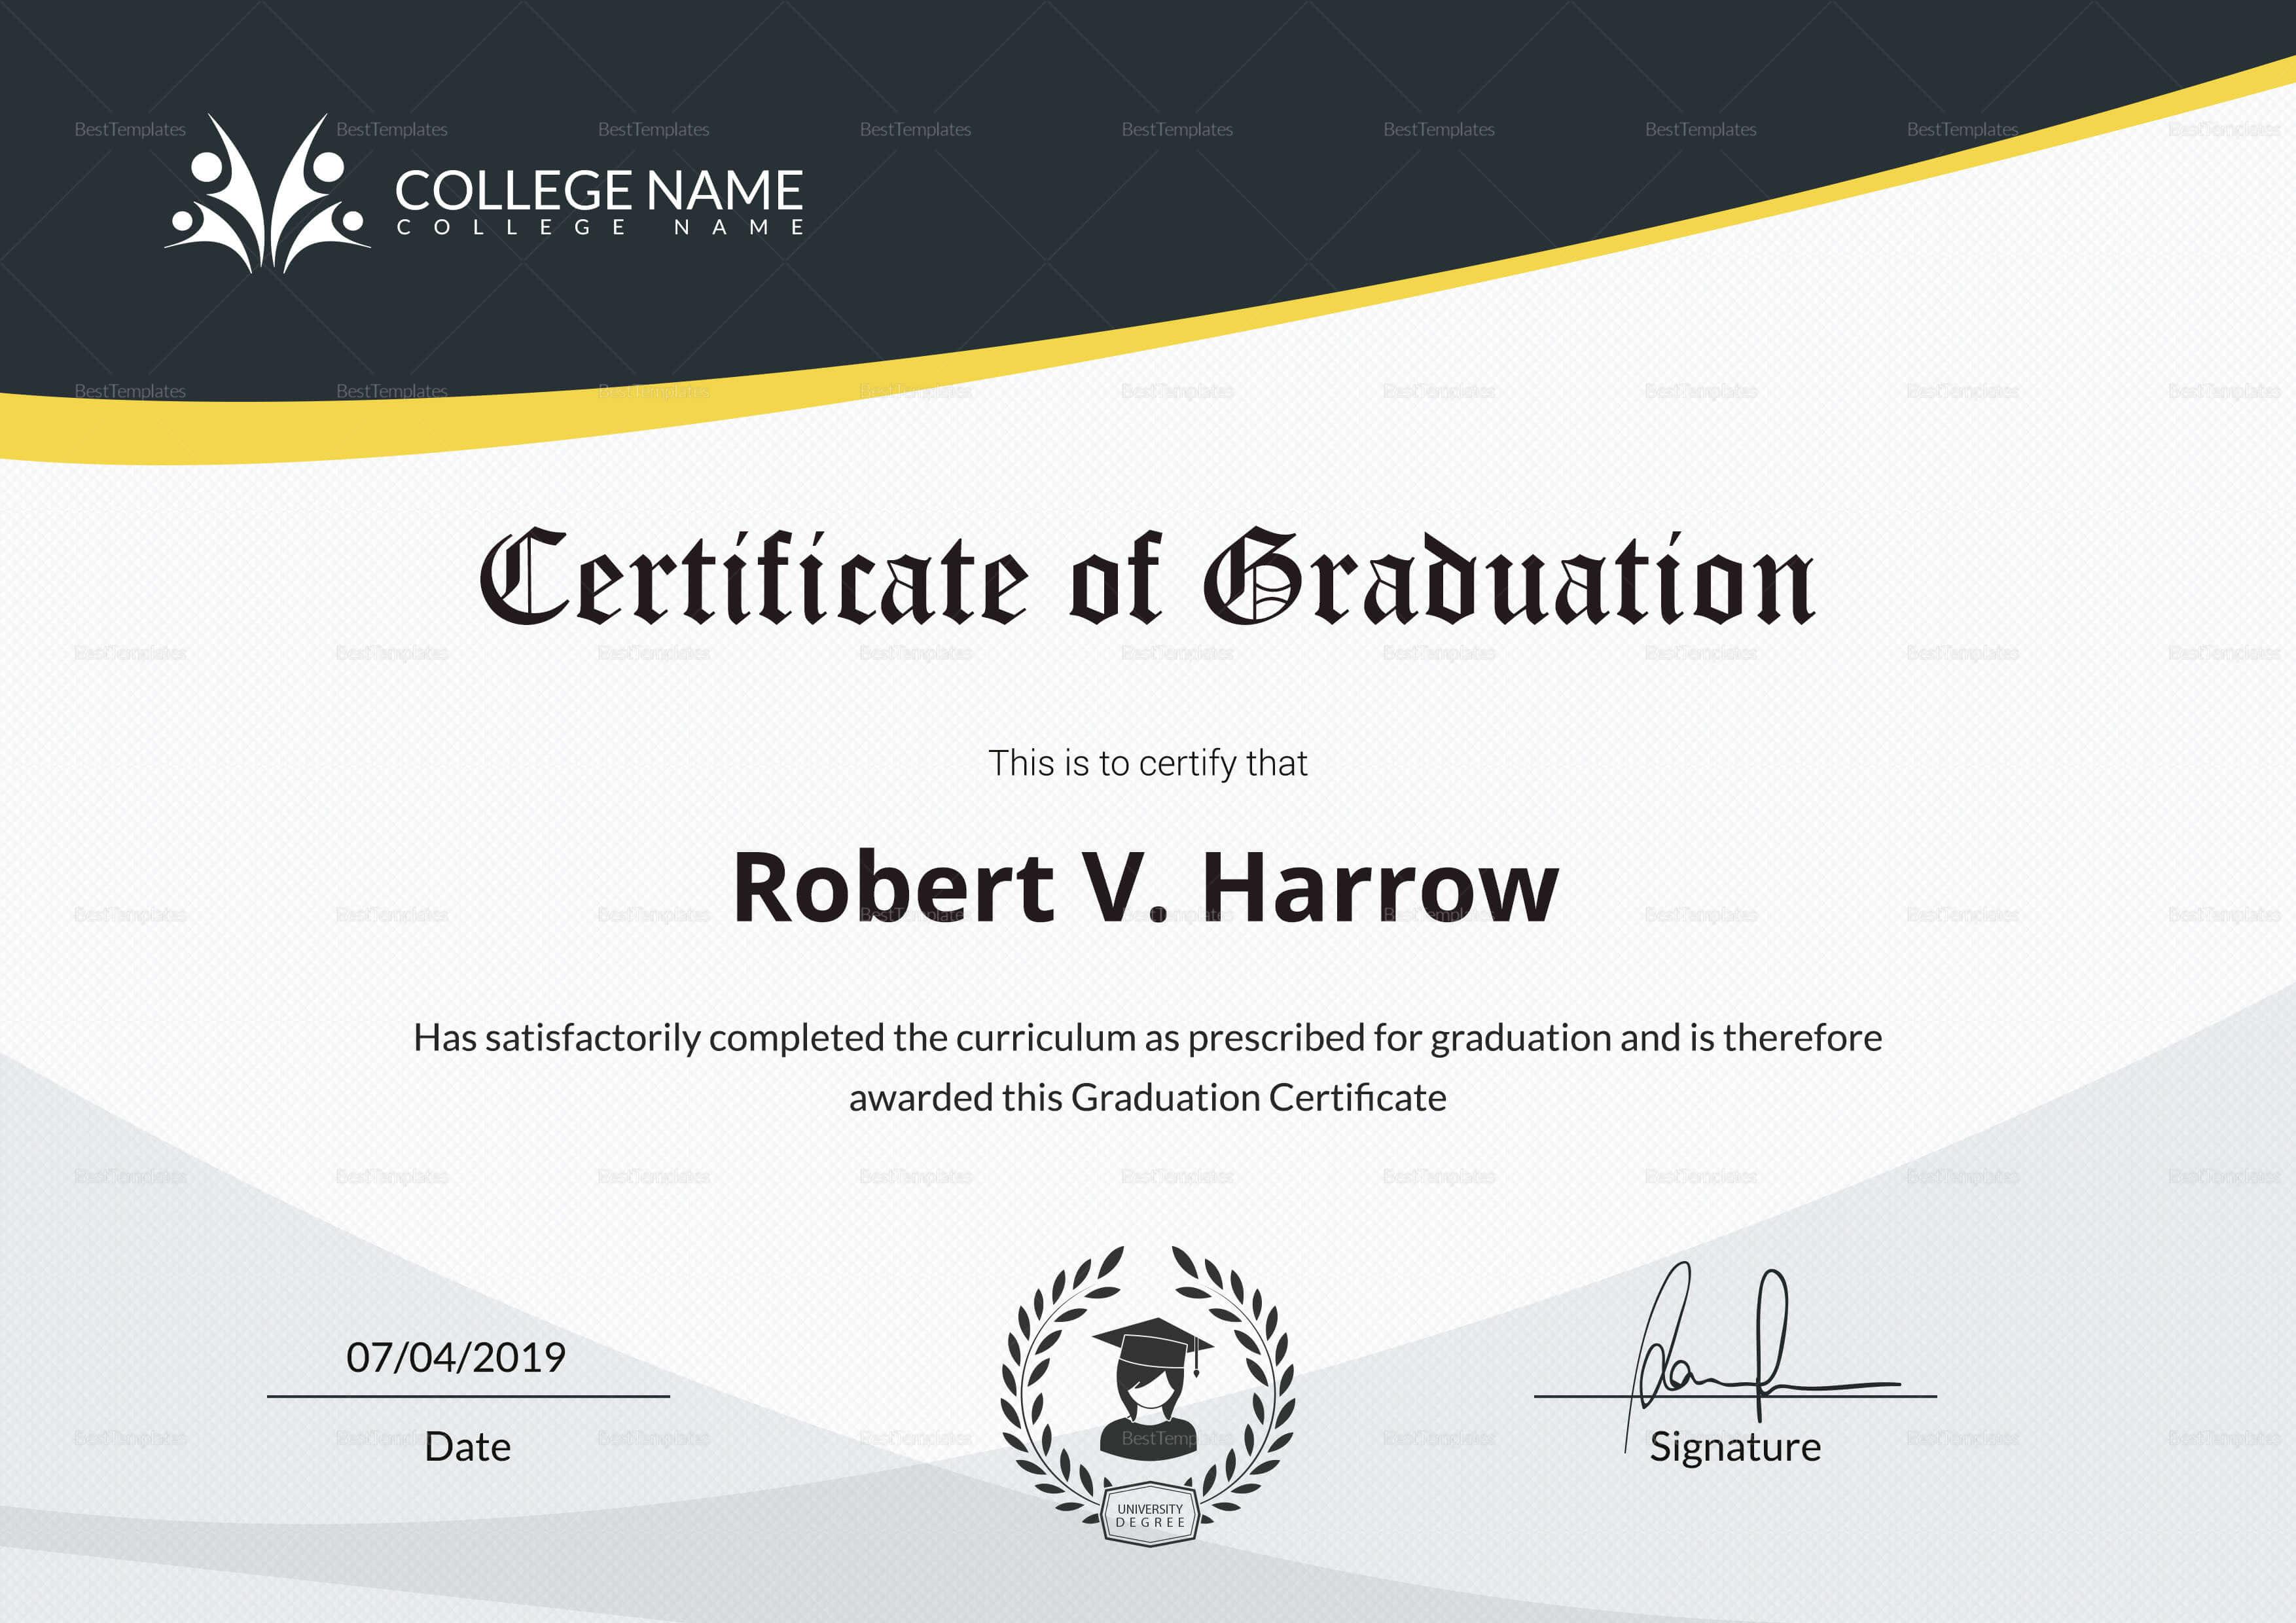 Universal College Graduation Certificate Template With Regard To College Graduation Certificate Template